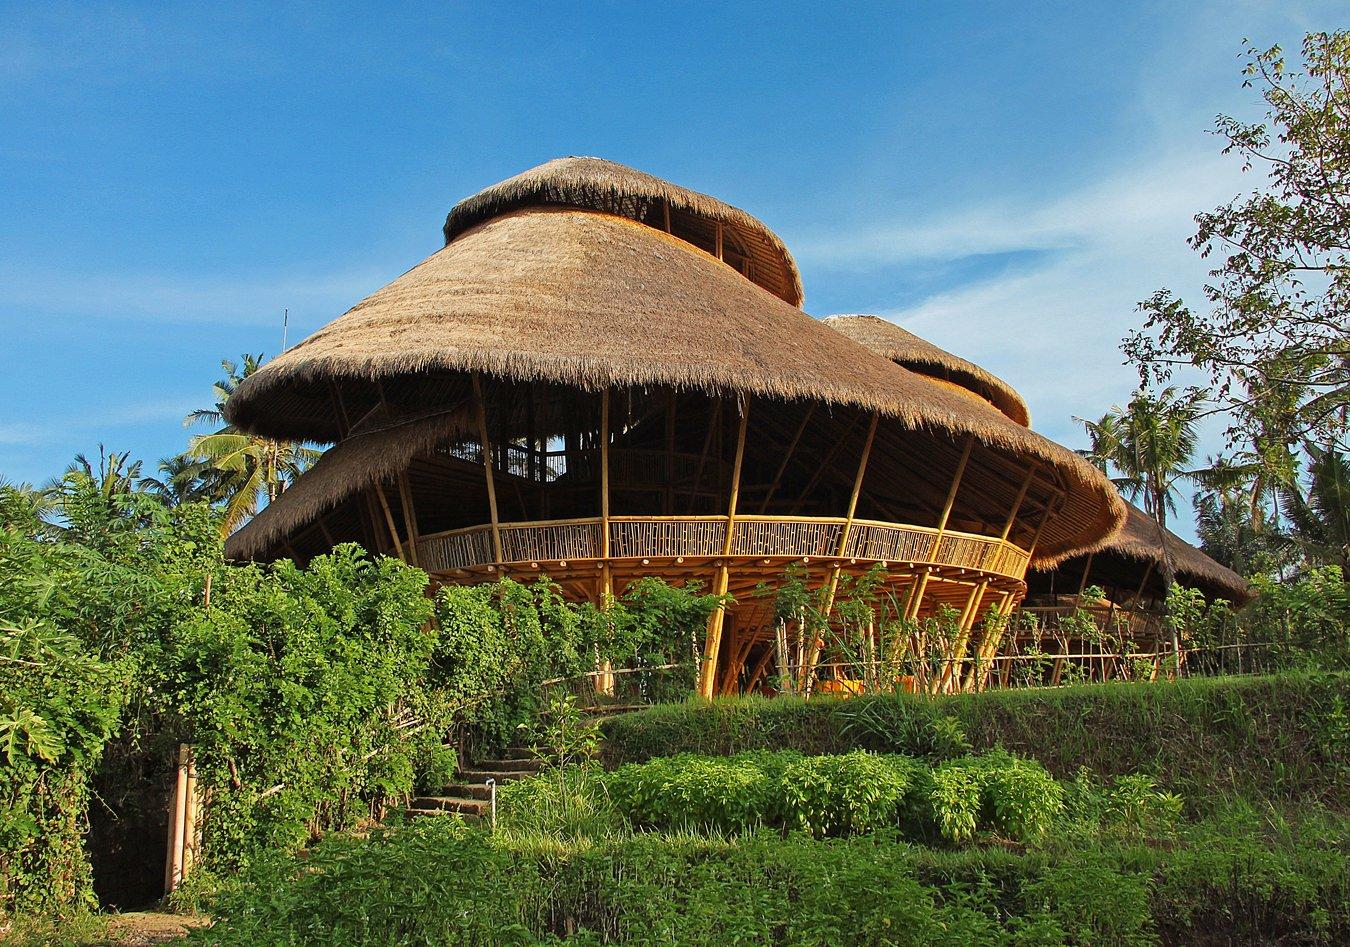 The World's Greenest School in the Jungles of Bali